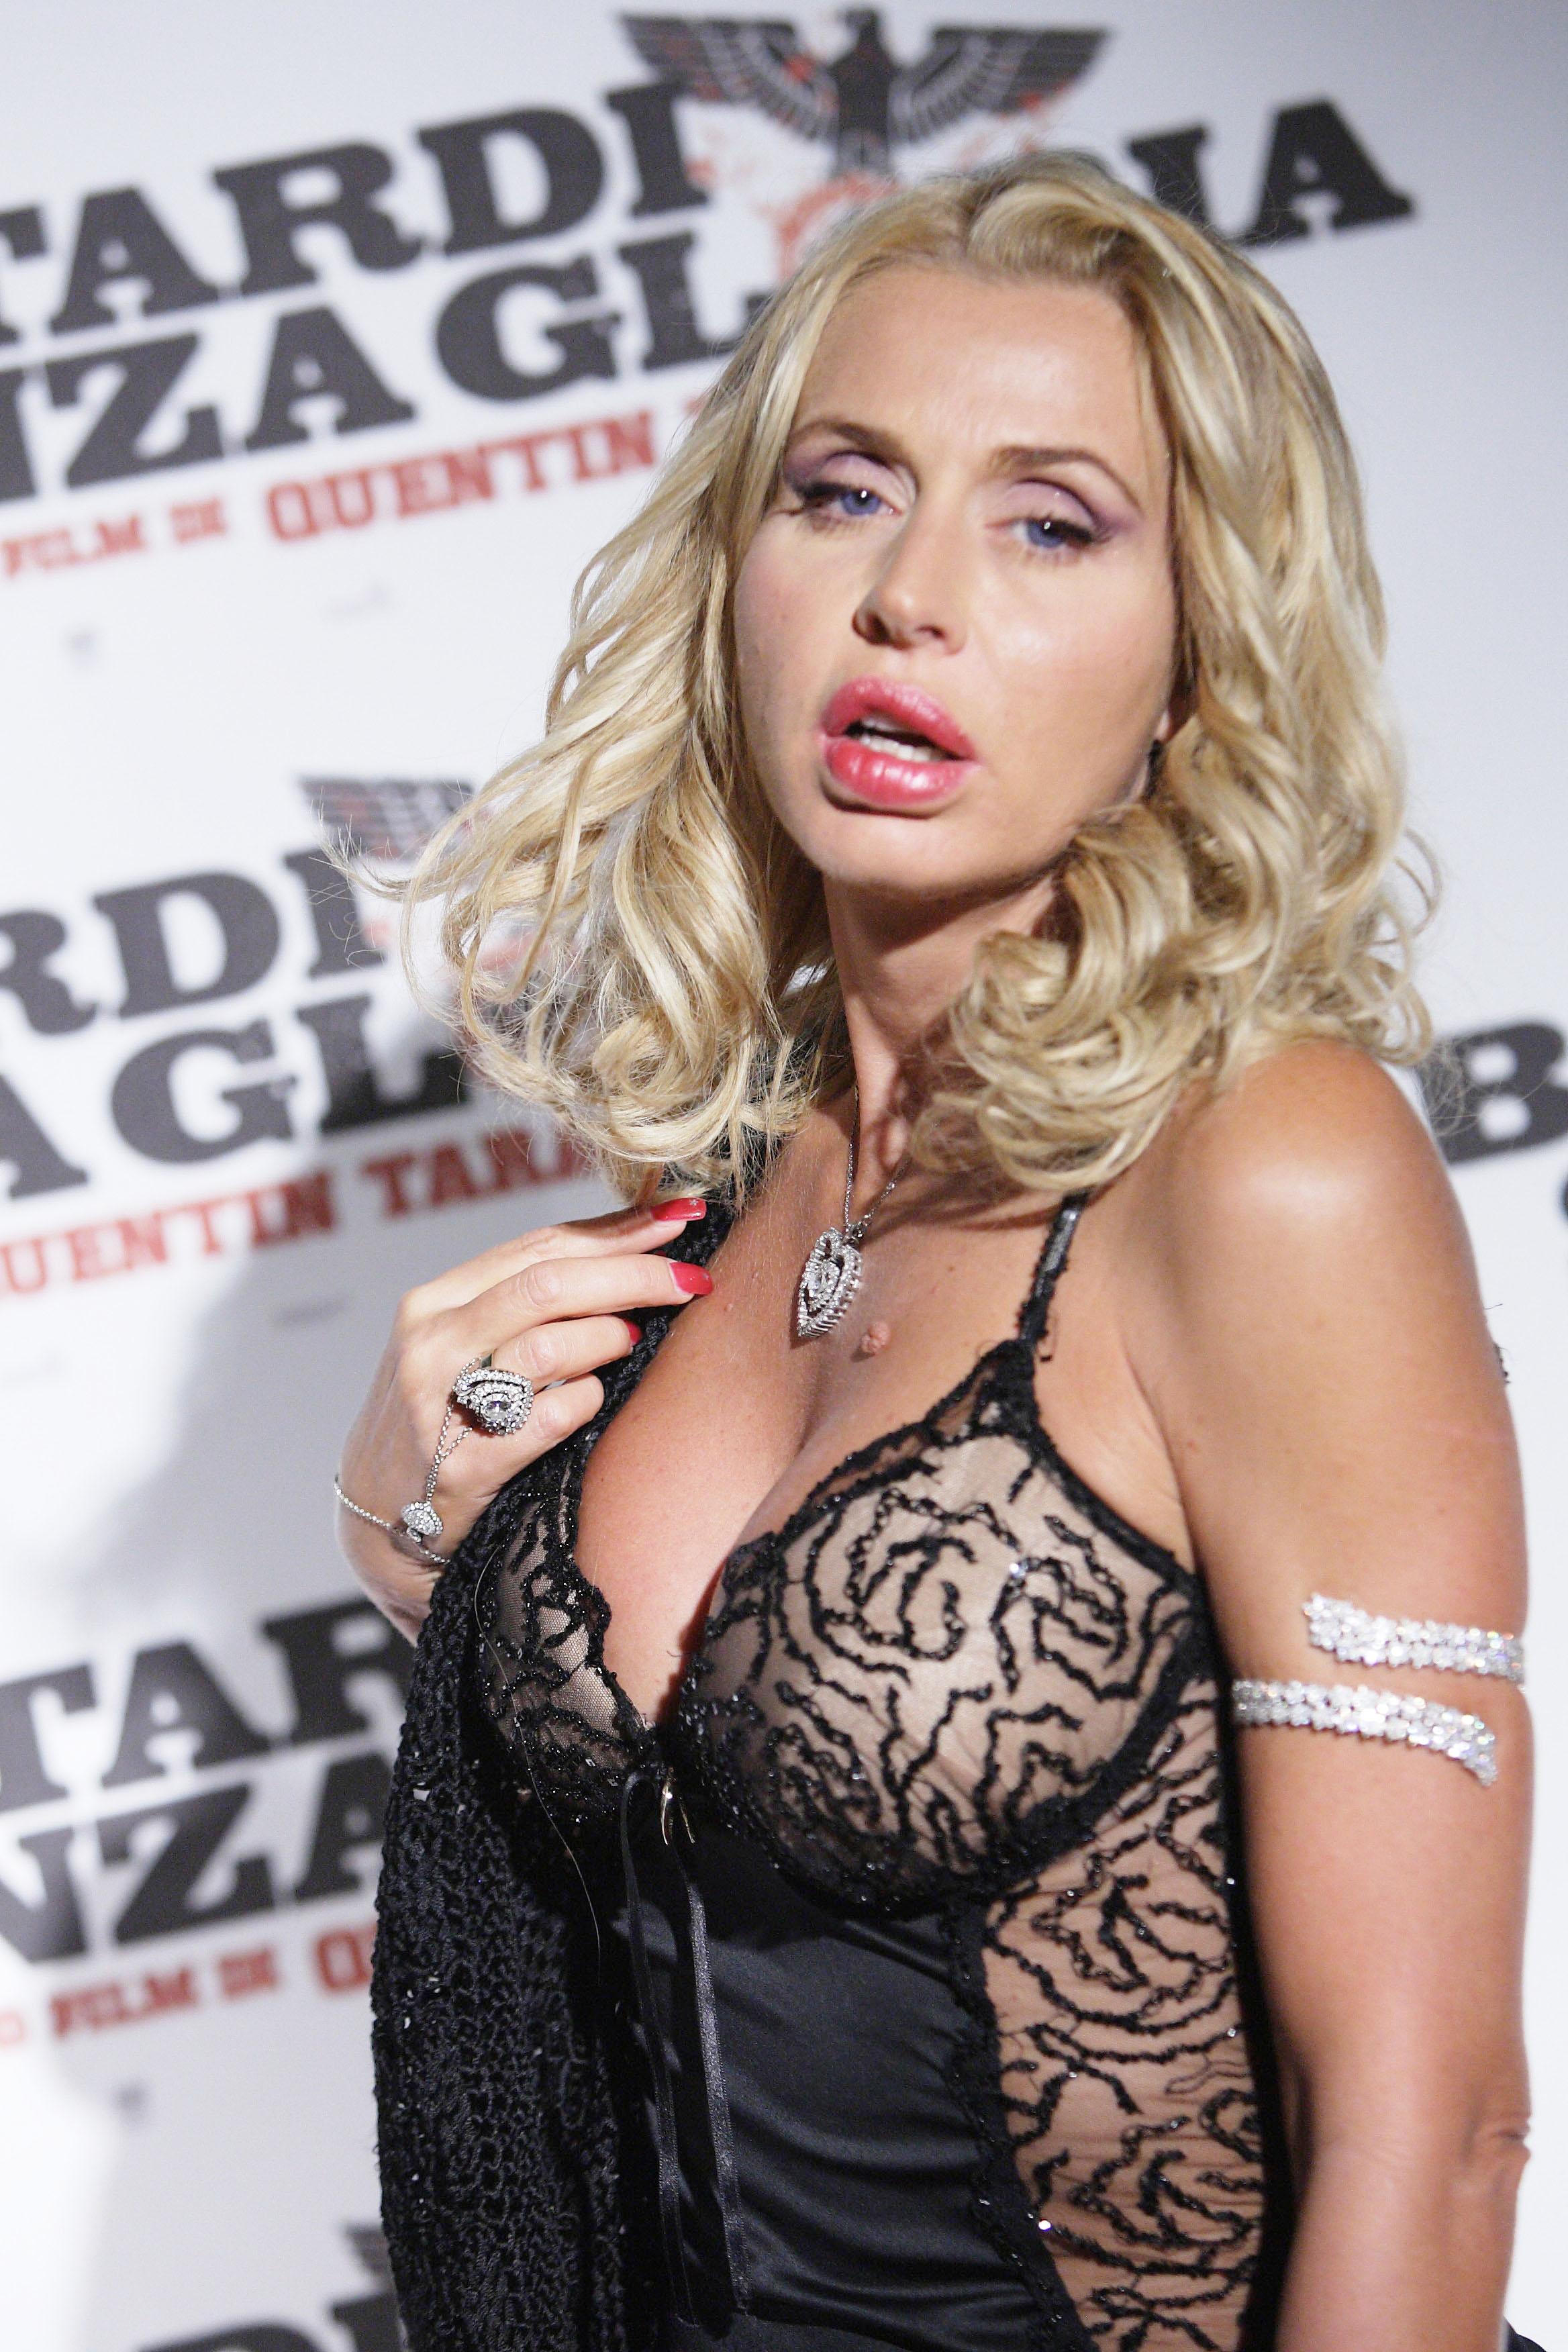 Paparazzi Valeria Marini nudes (63 foto and video), Sexy, Hot, Twitter, underwear 2006